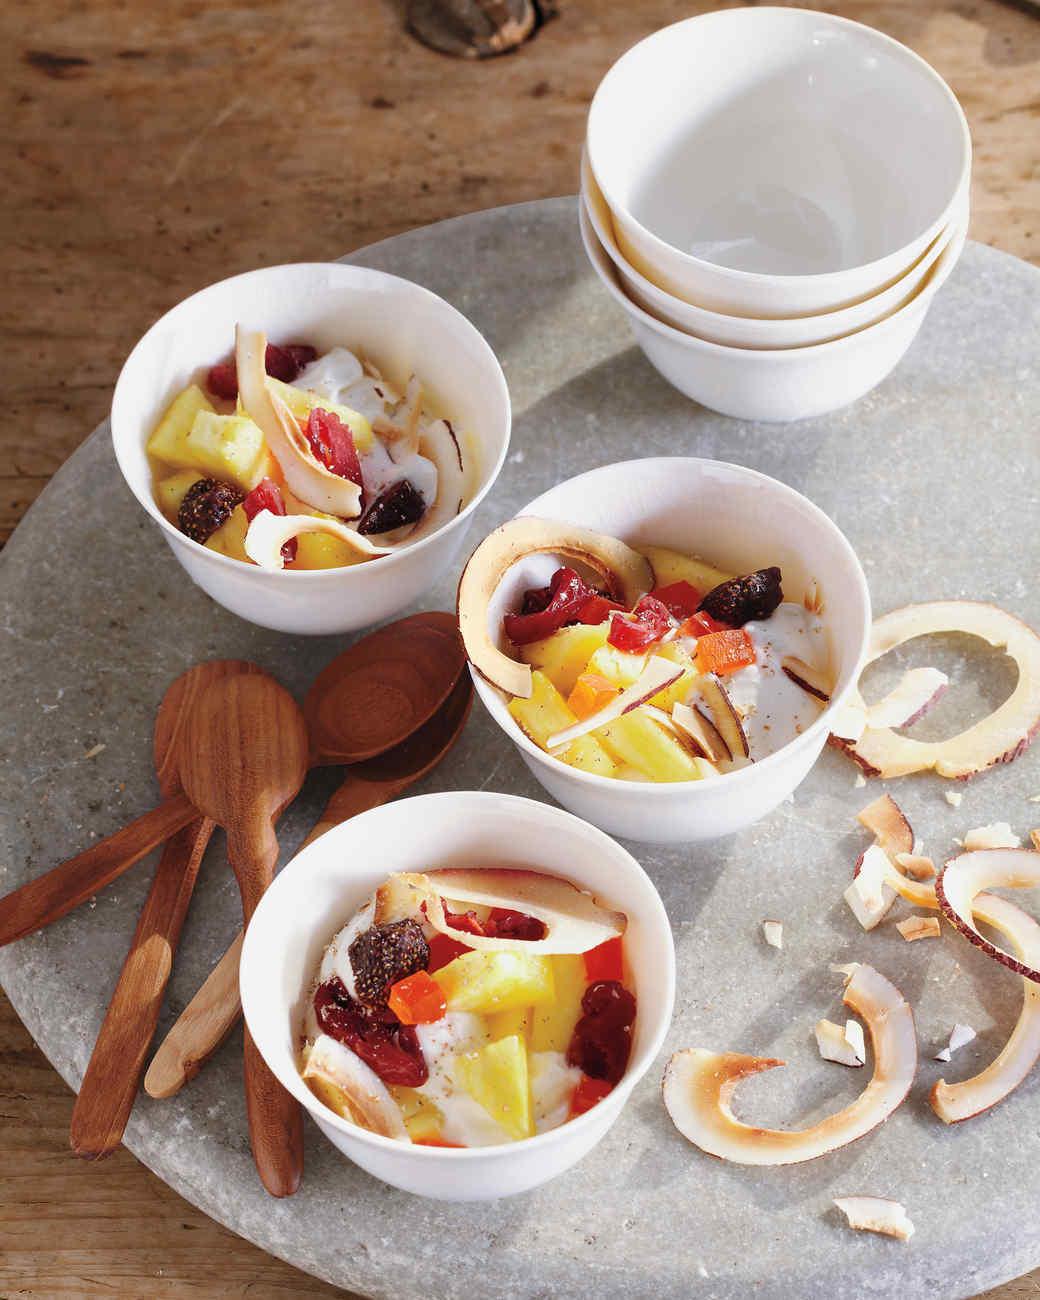 greek-yogurt-pineapple-ambrosia-064-mld110880.jpg